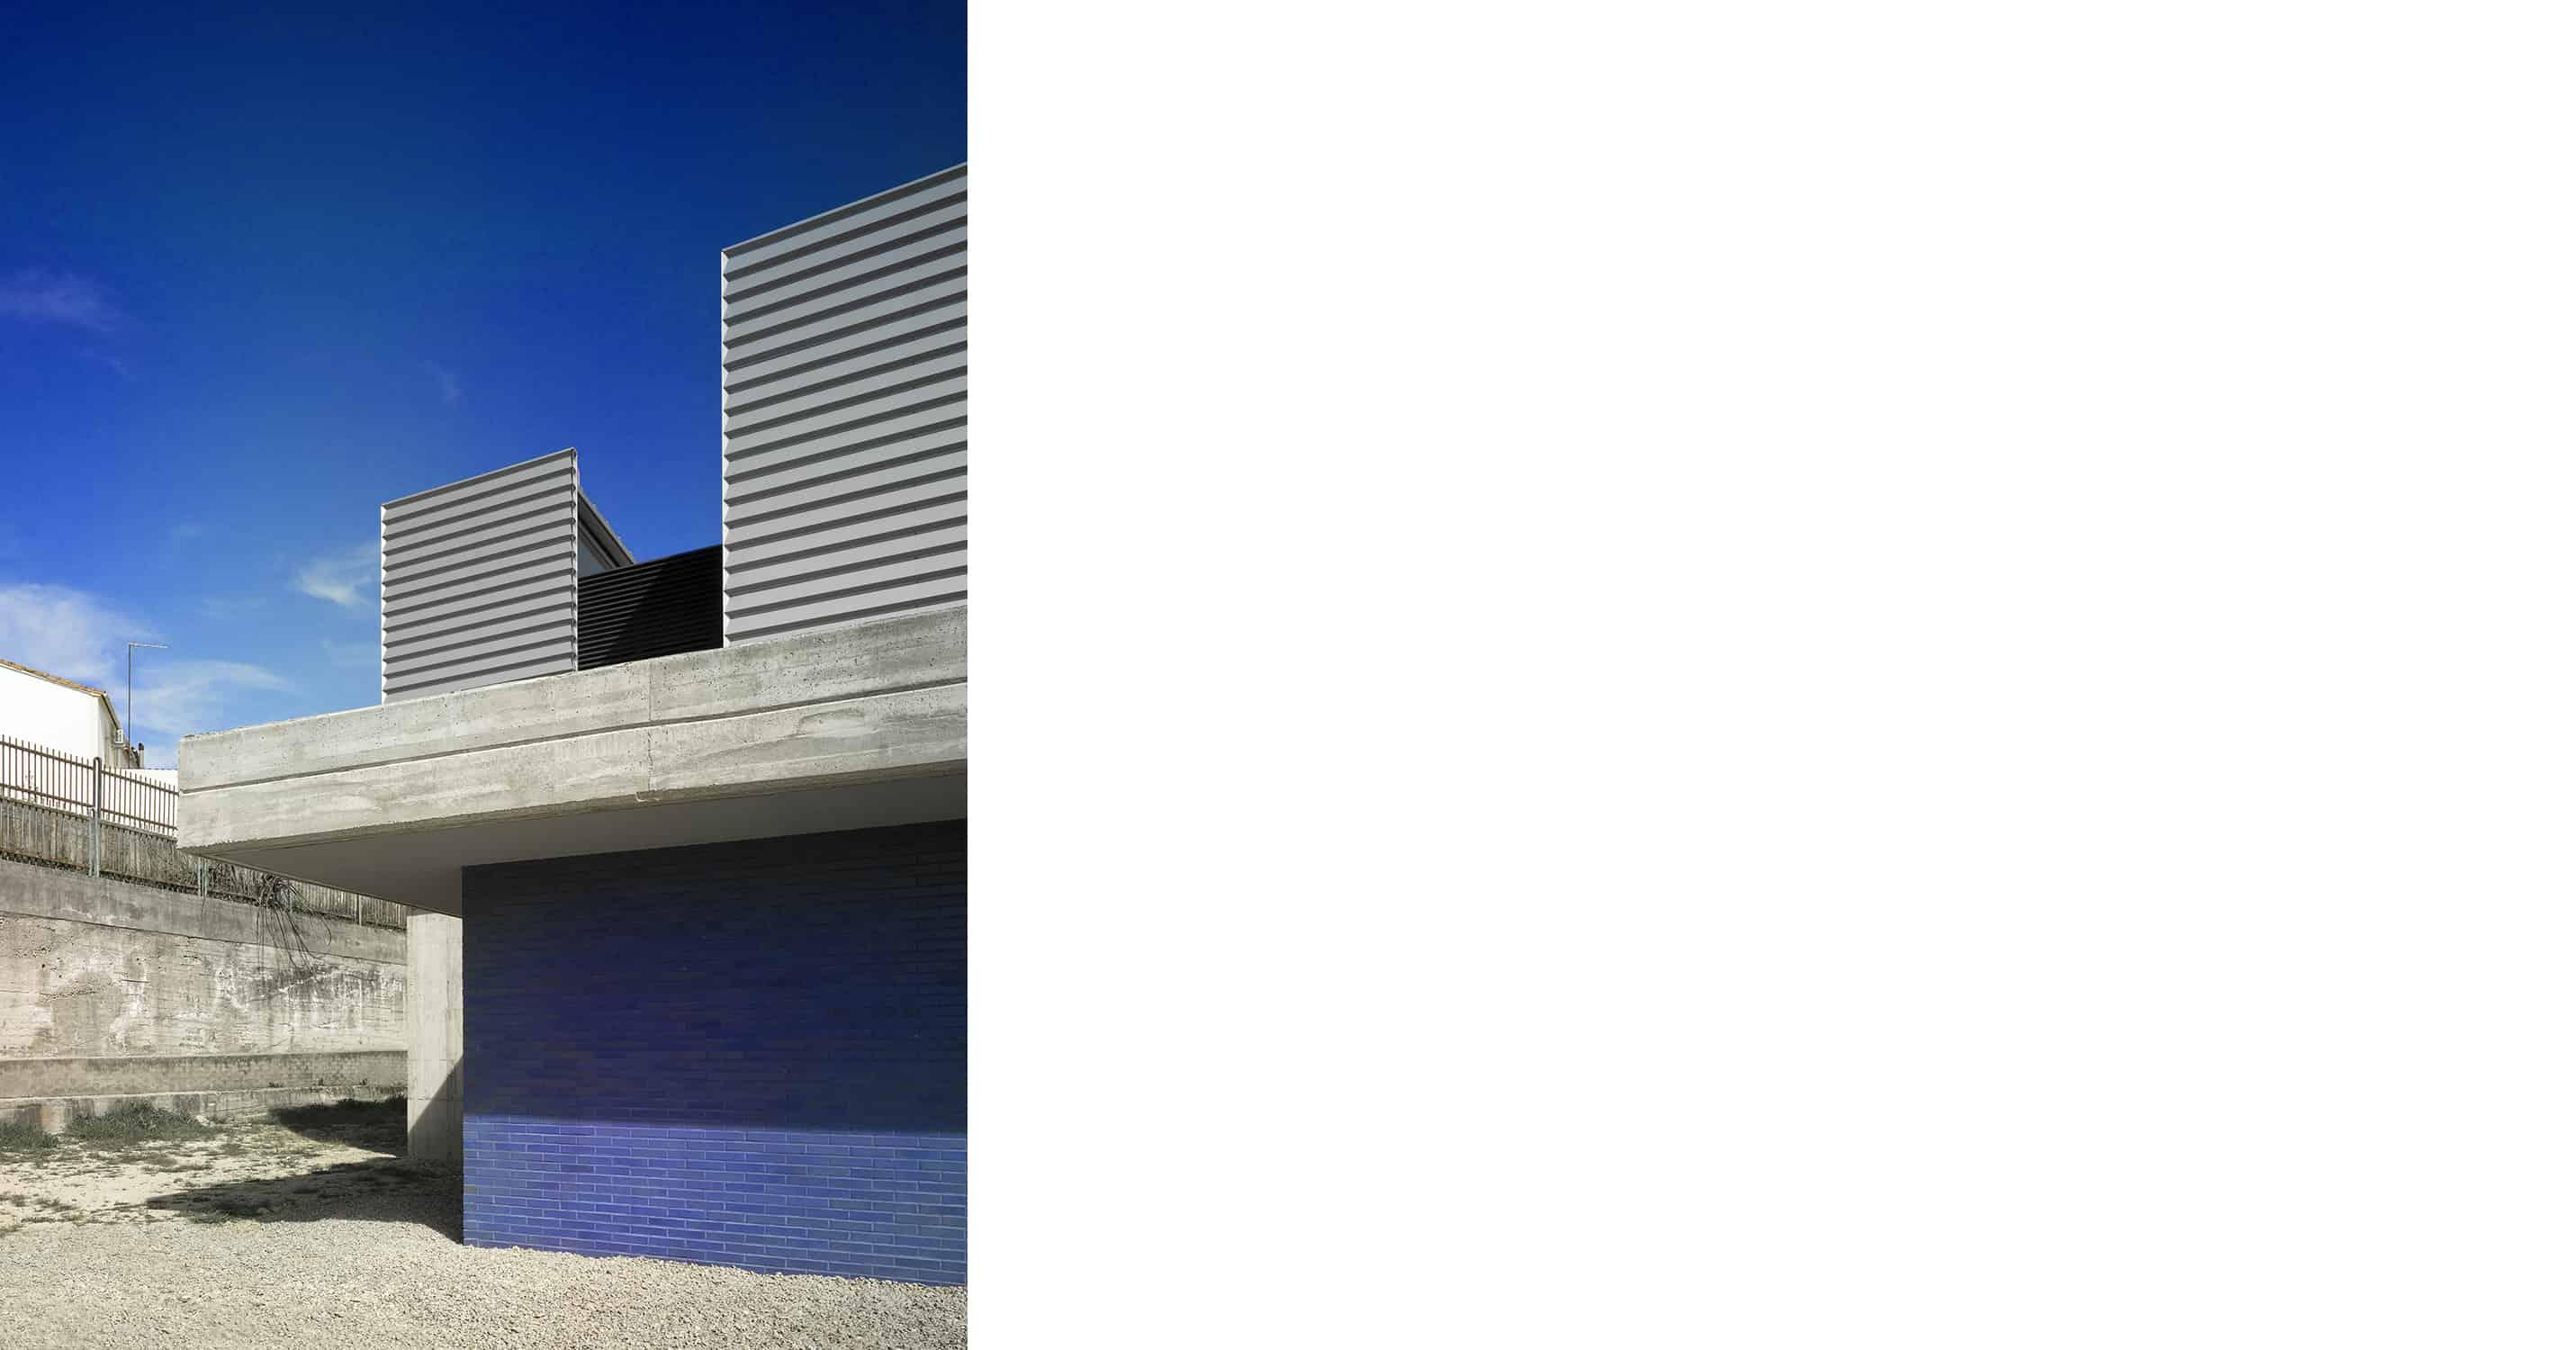 PABELLON GIMNASIA JARAIZ - arquitectura deportiva - LANDINEZ+REY | equipo L2G arquitectos, slp [ eL2Gaa ]